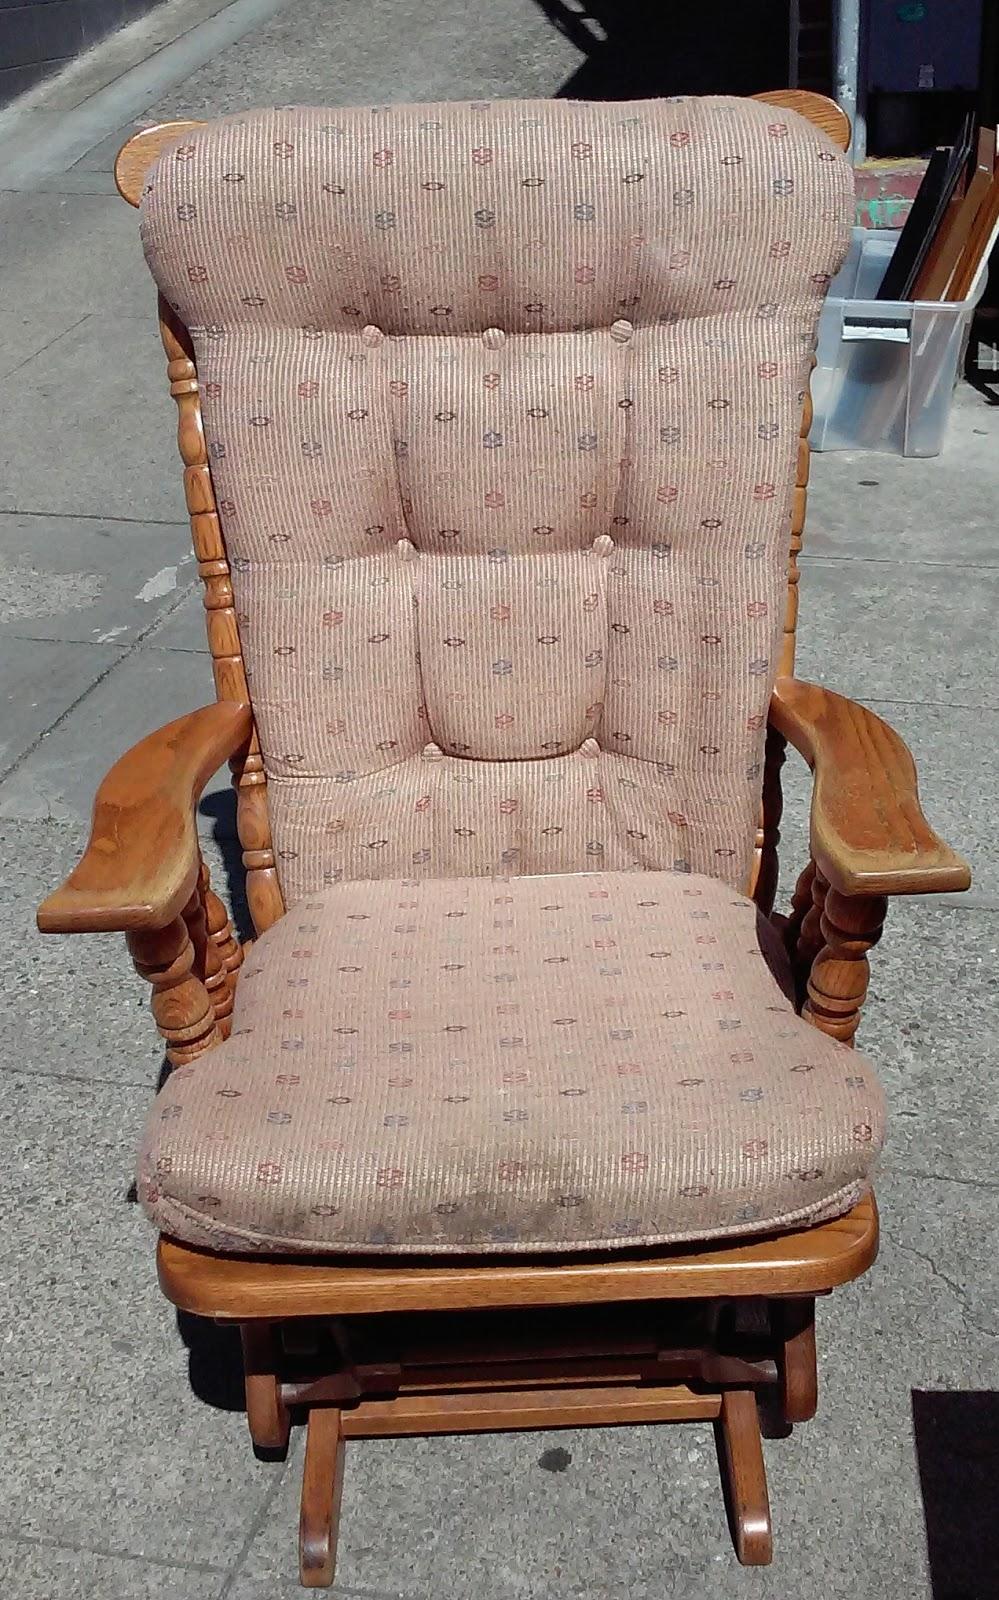 Uhuru Furniture Amp Collectibles Sold Summer Super Chair